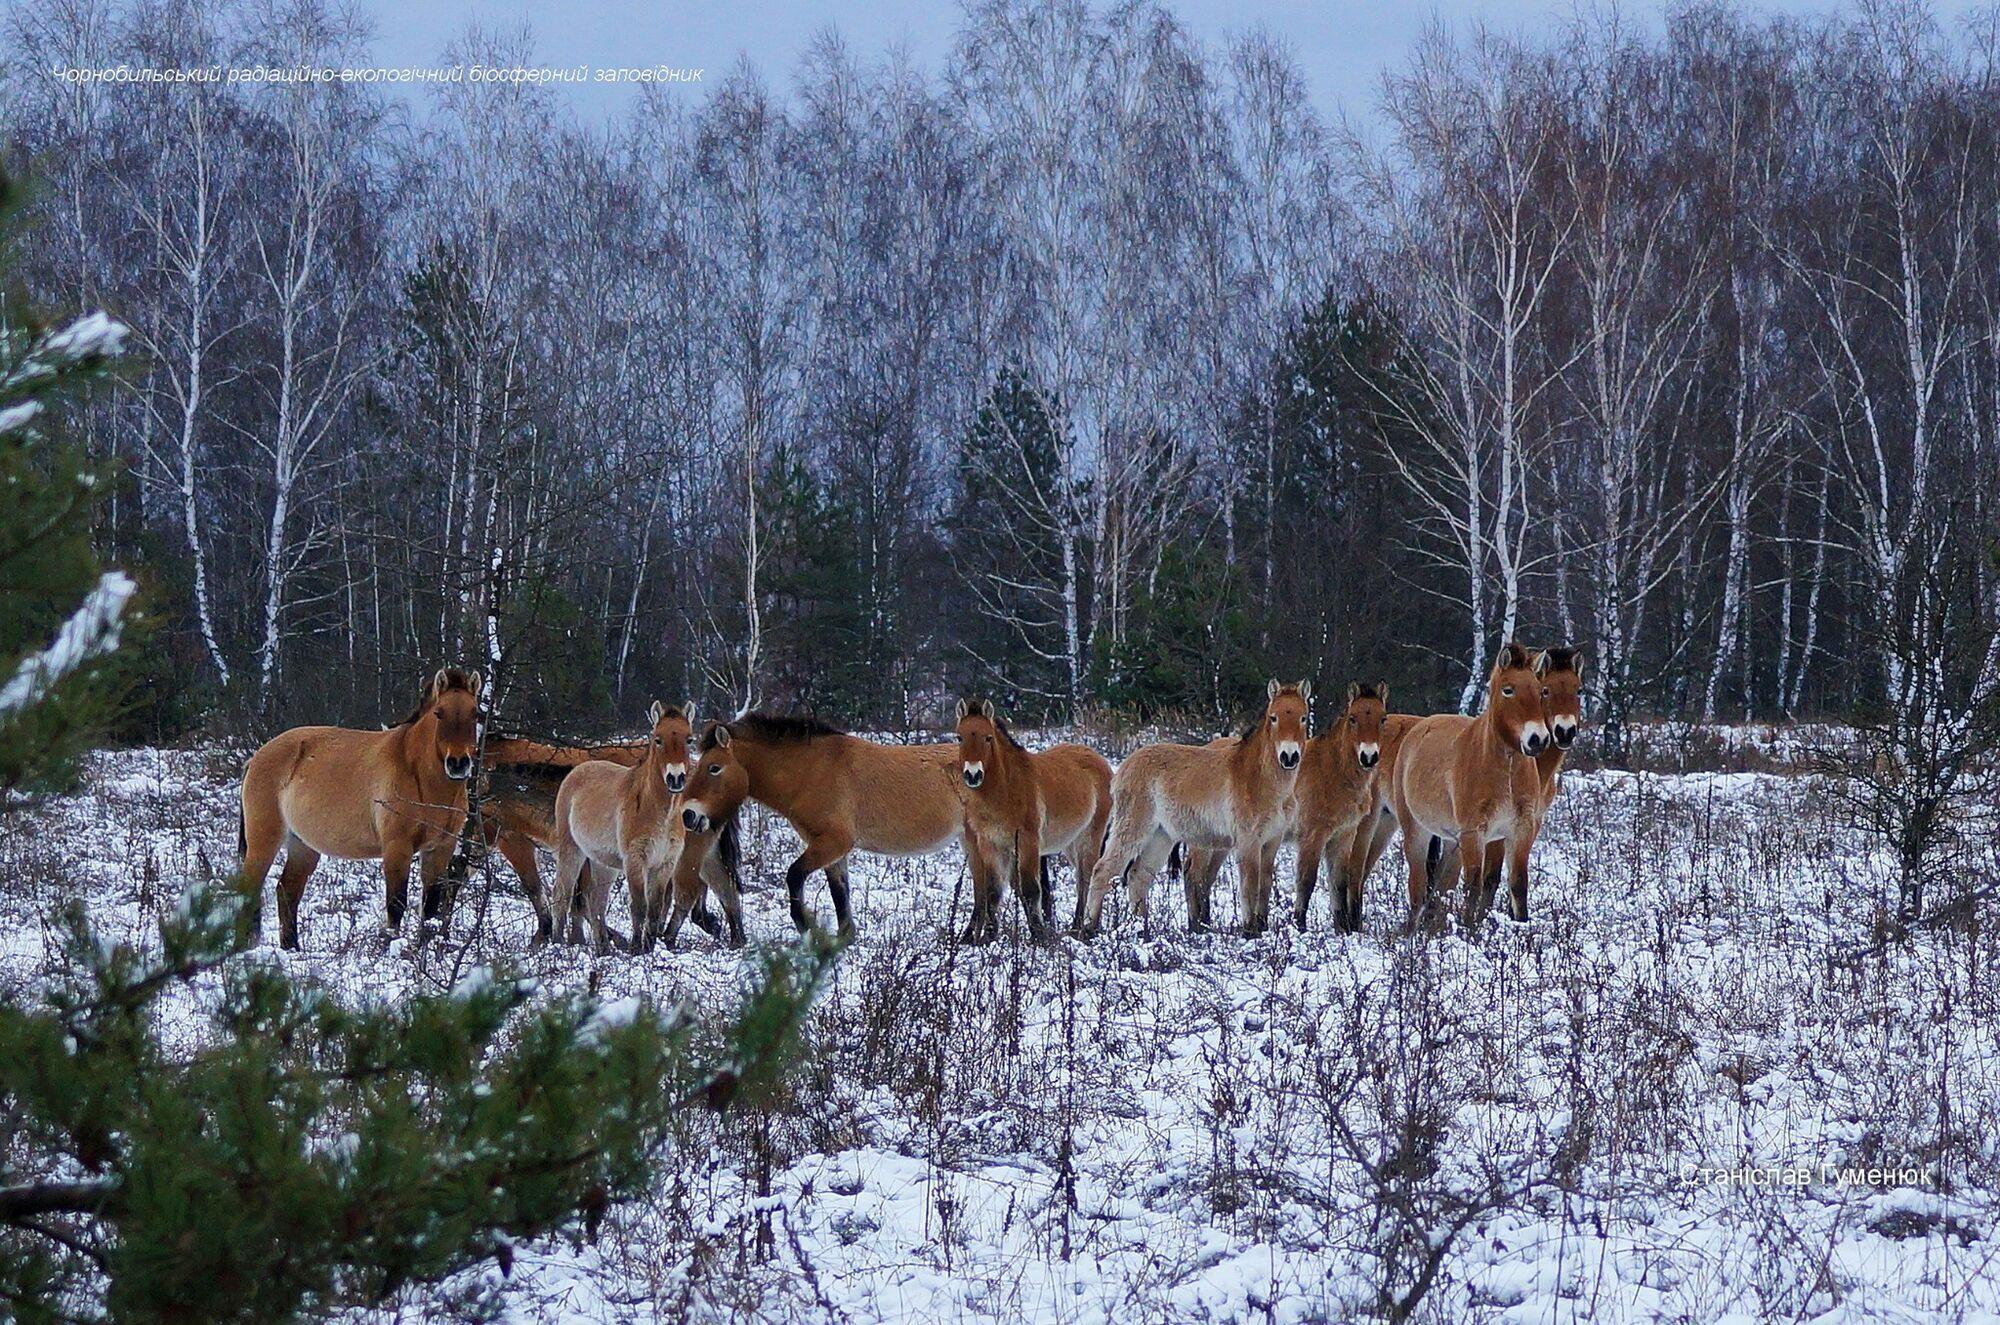 Тварини гуляли засніженими стежками